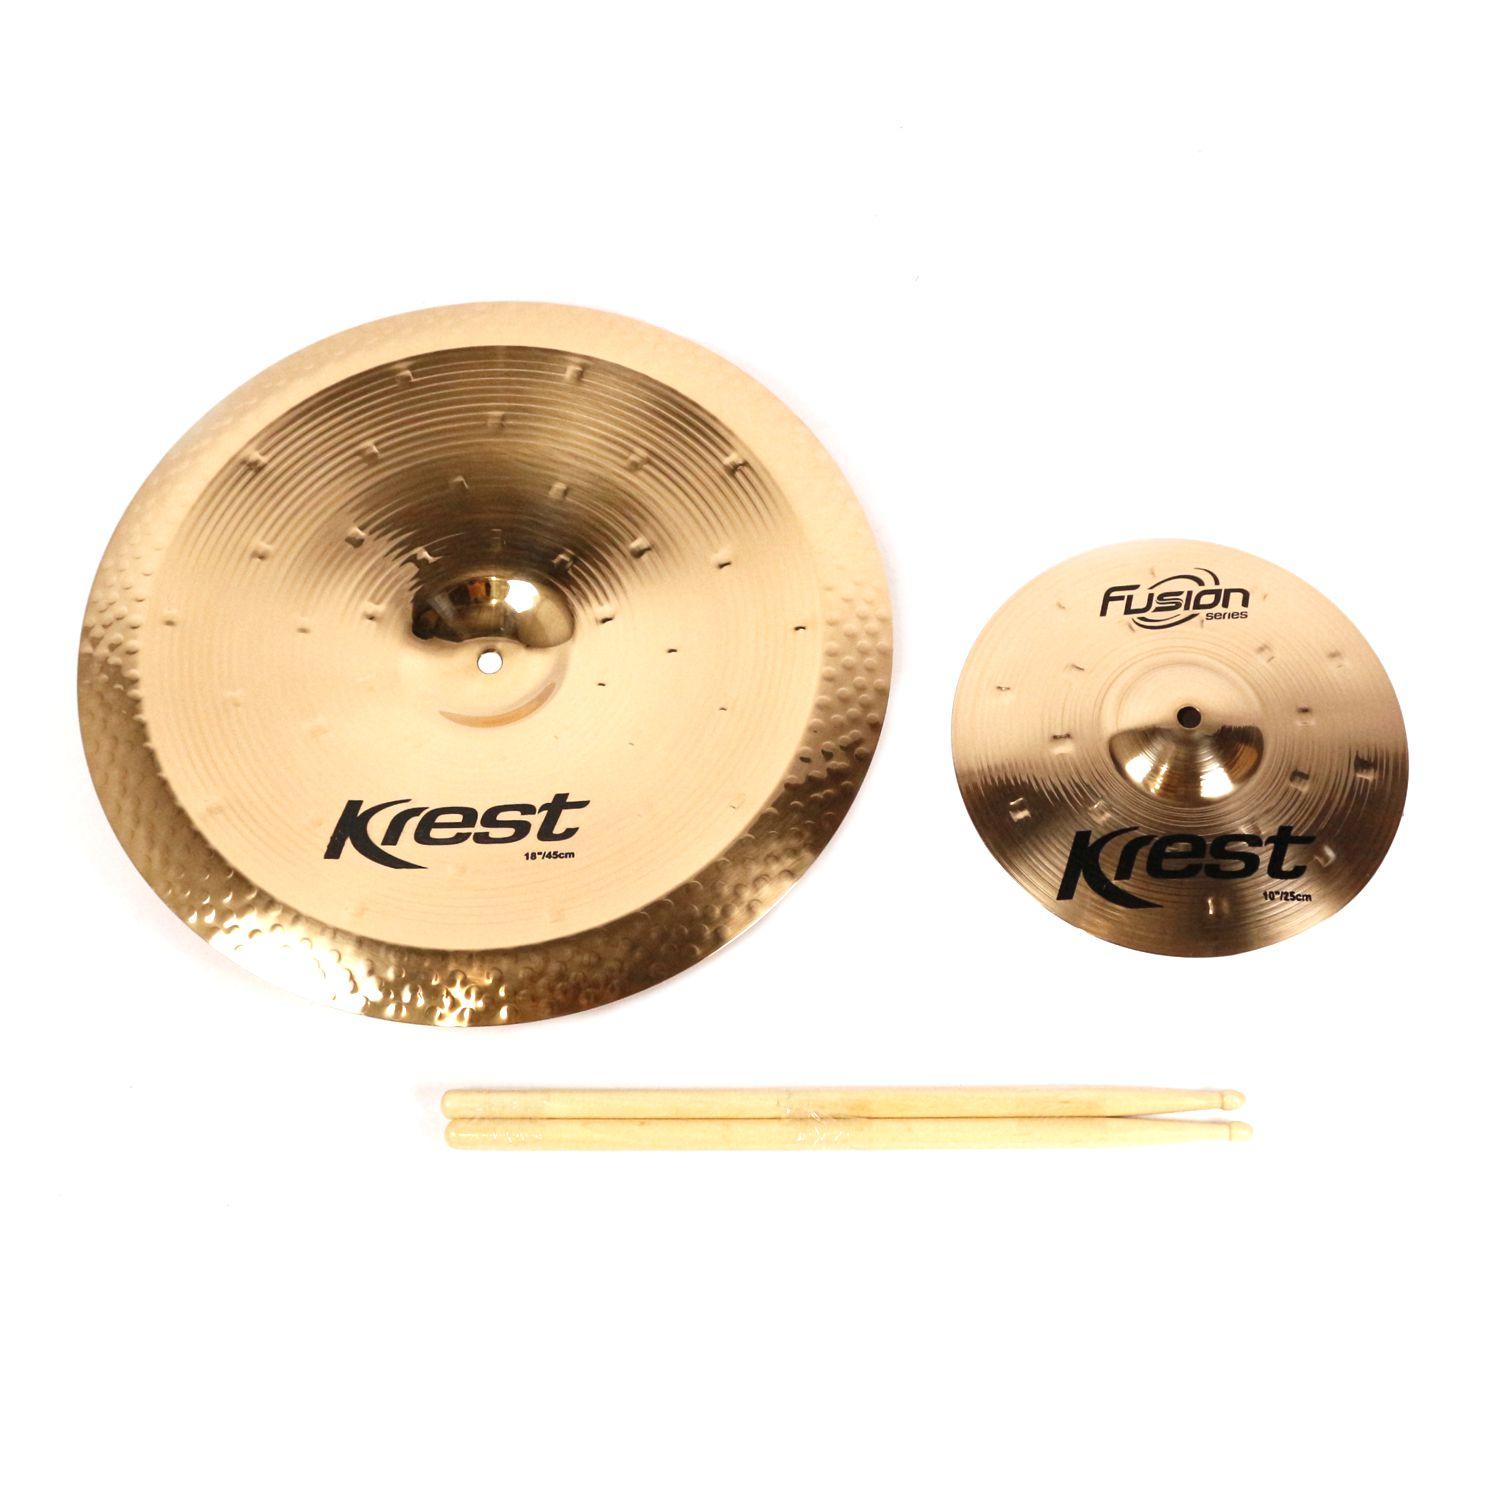 Kit de Pratos Fusion KREST CYMBALS China 18 - SPLASH 10 - Bronze B8